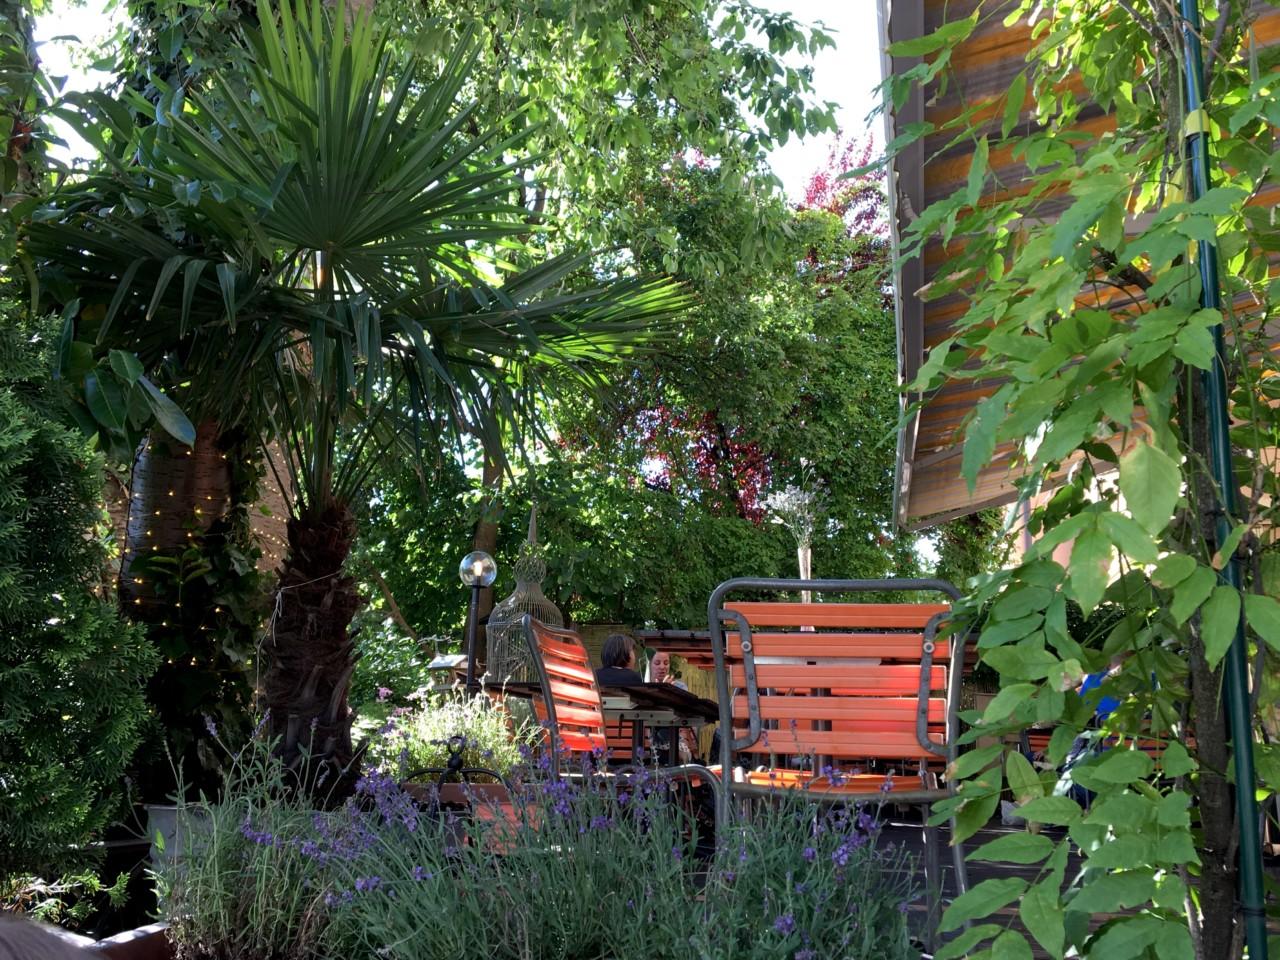 Viel Grün umgibt Freyas Sommer. Foto: Lunchgate/Simone